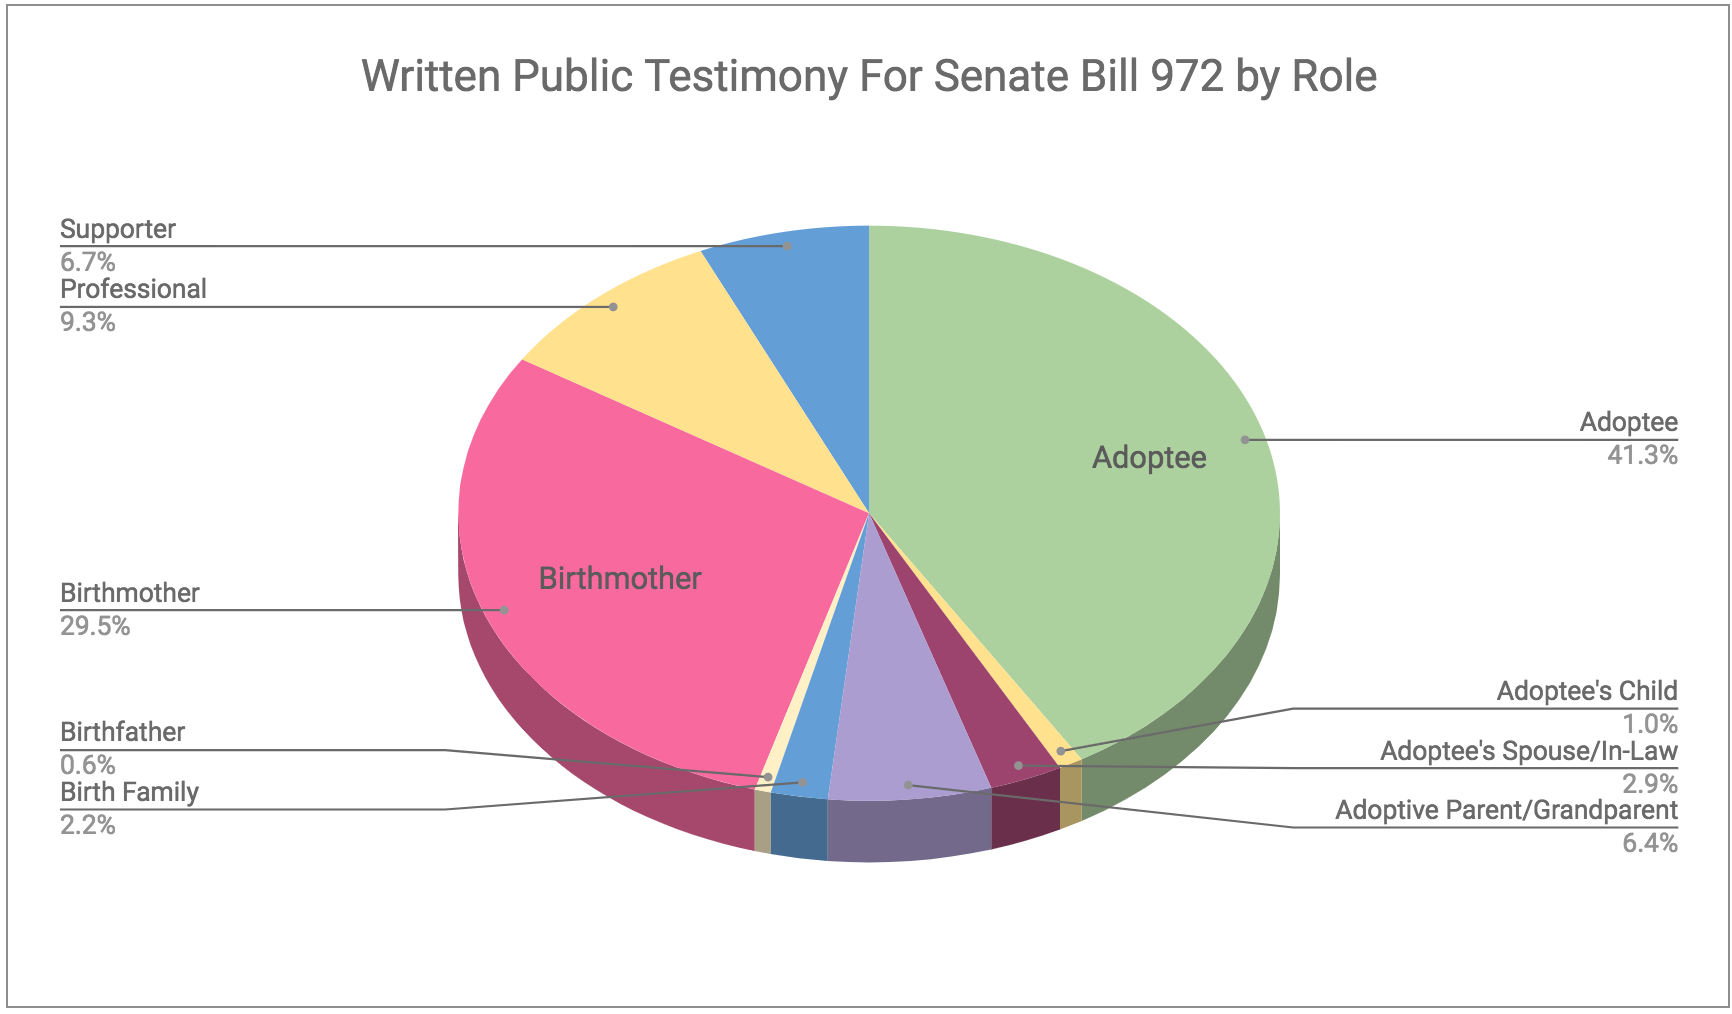 image-senate-bill-972-testimonies.png